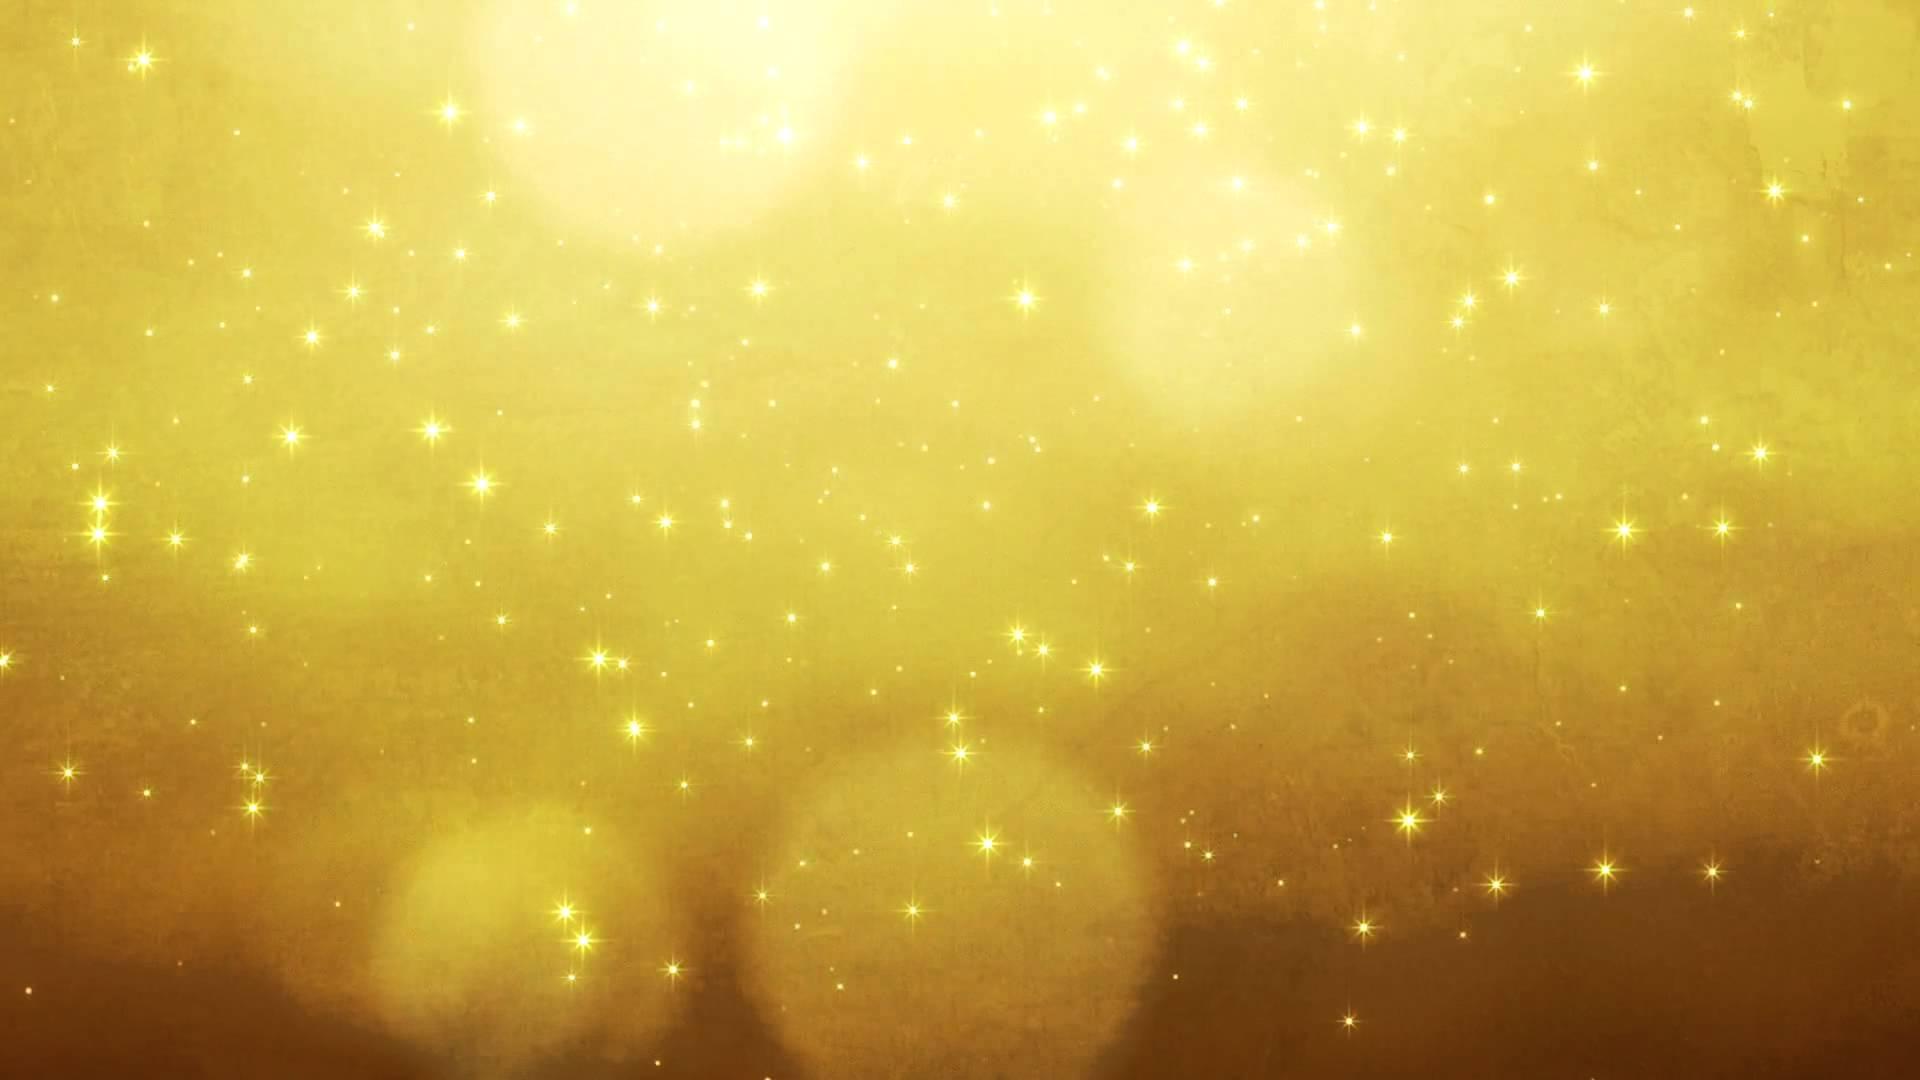 20+ Gold Glitter Backgrounds